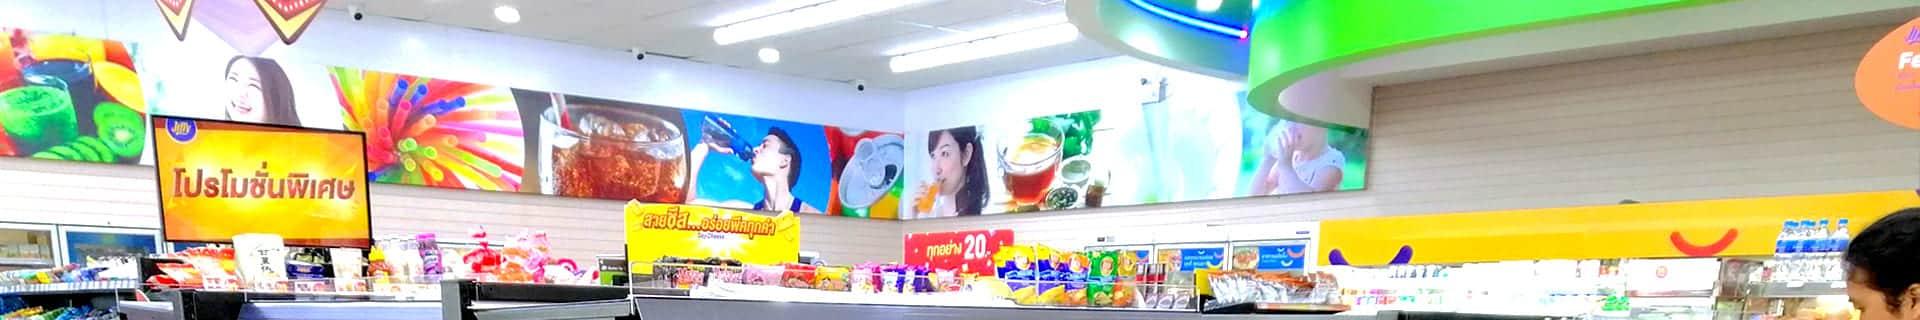 Minimart